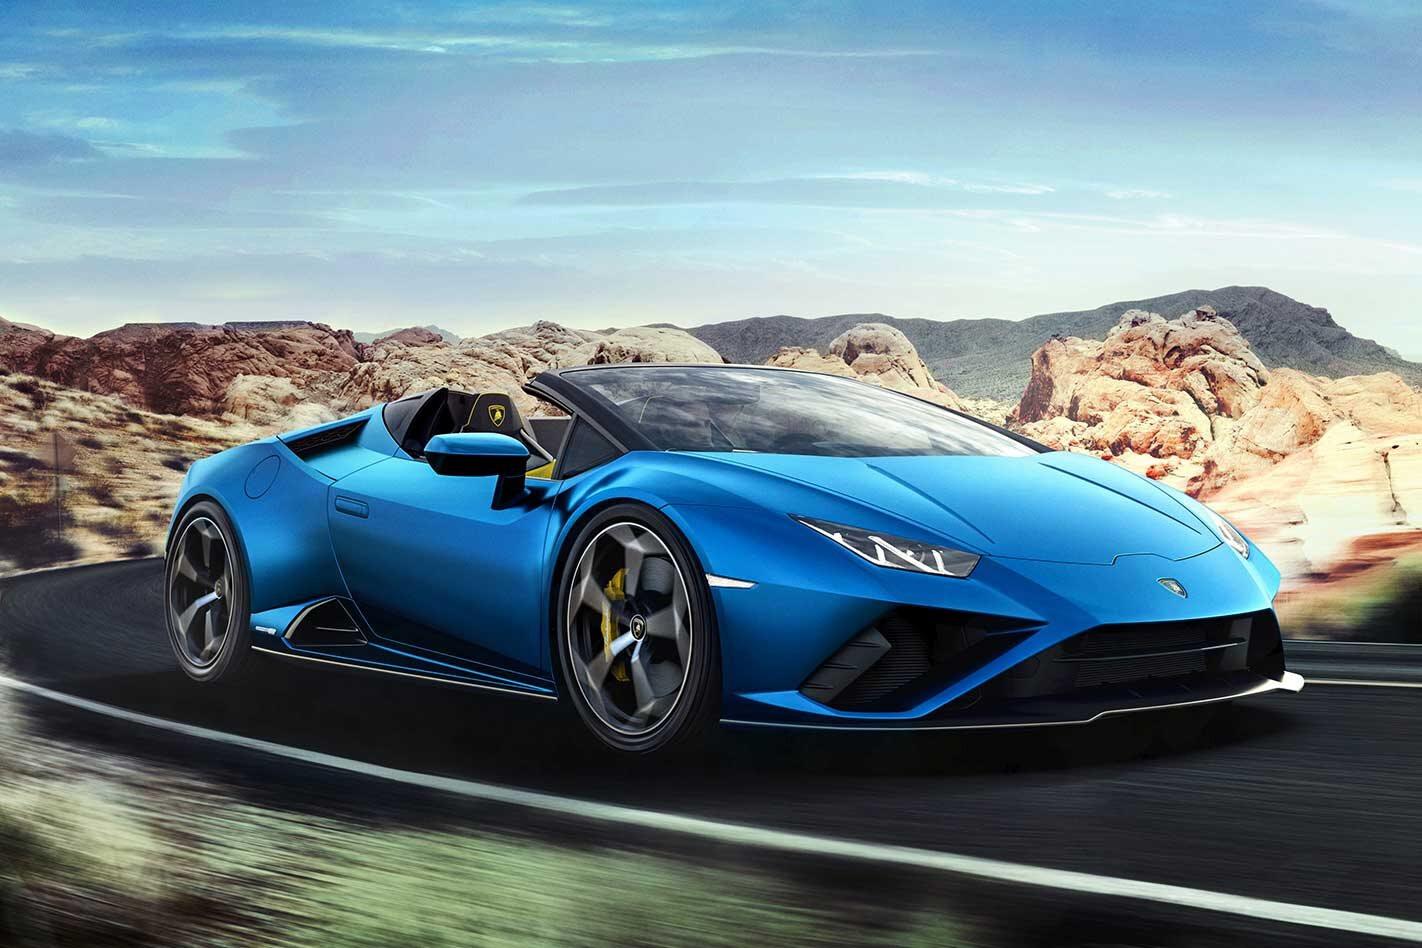 Lamborghini Huracan Evo RWD Spyder specs pricing